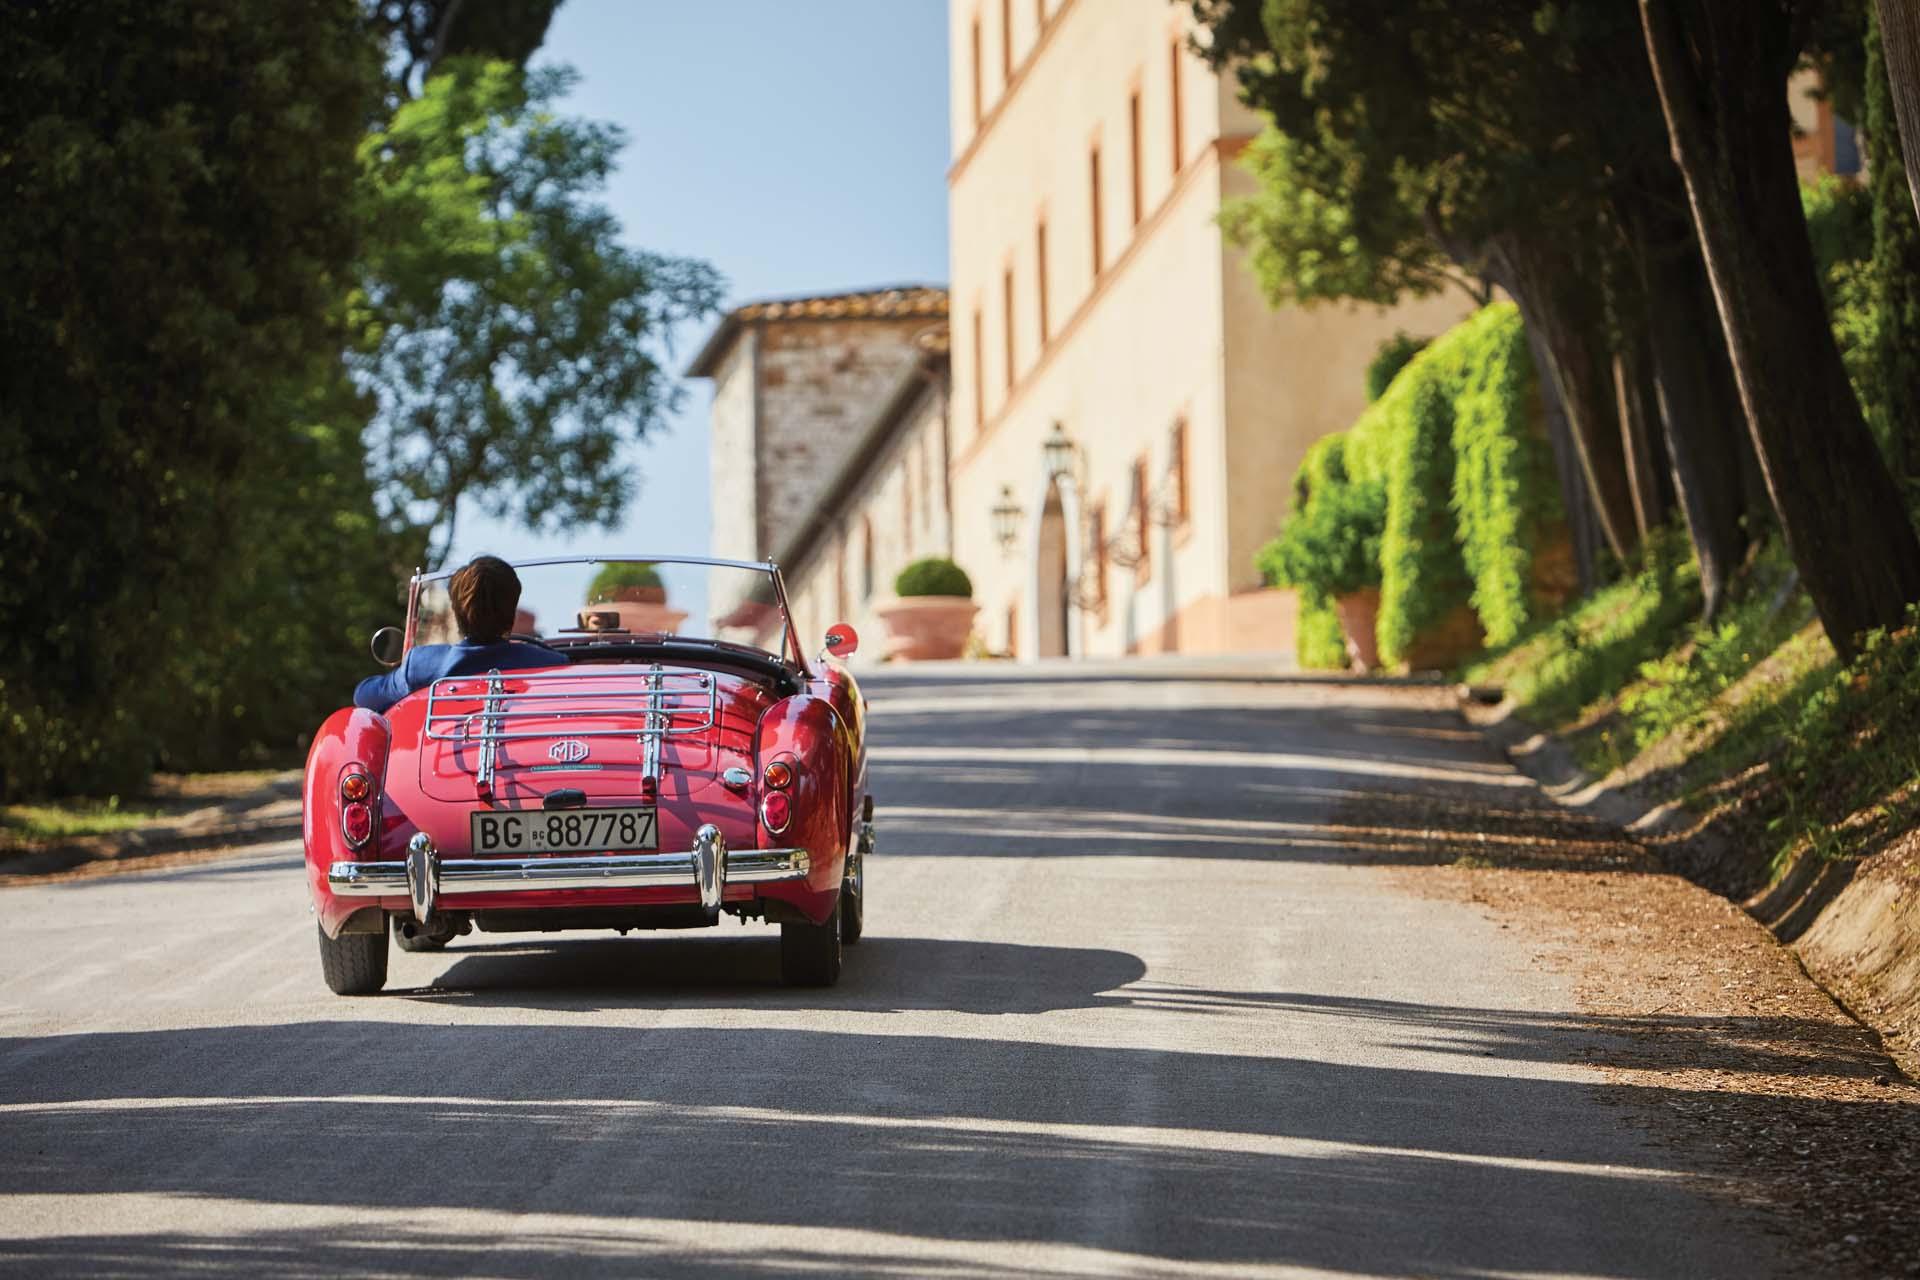 Umbria mia Tour de luxe |  Toskana & Umbrien | Oktober 2022